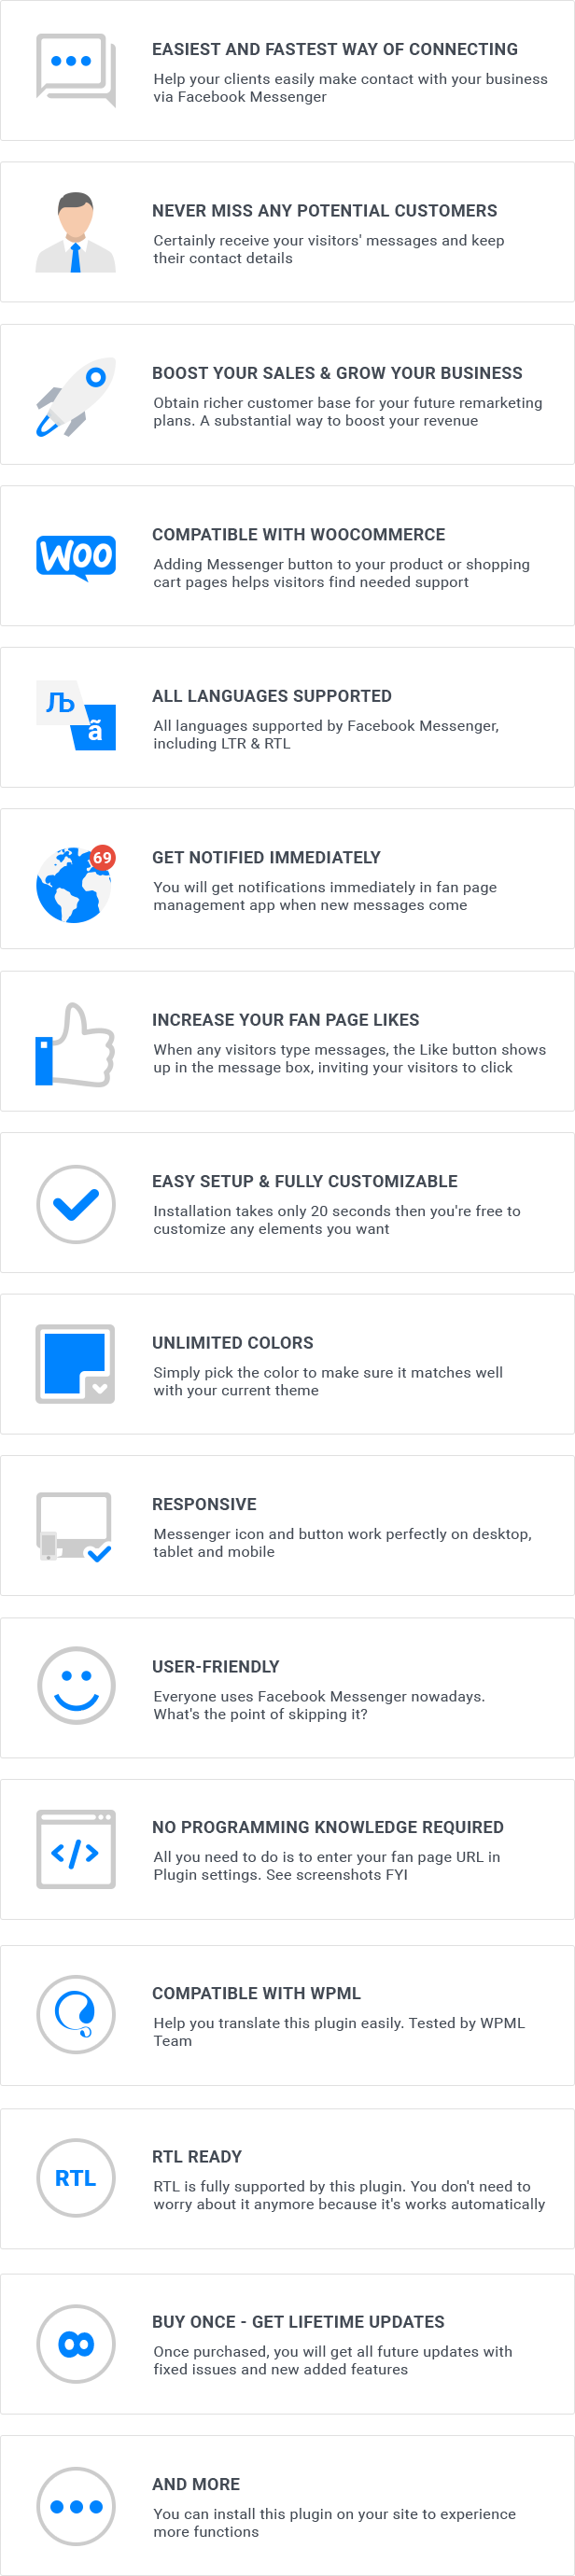 Facebook Messenger for WordPress Features